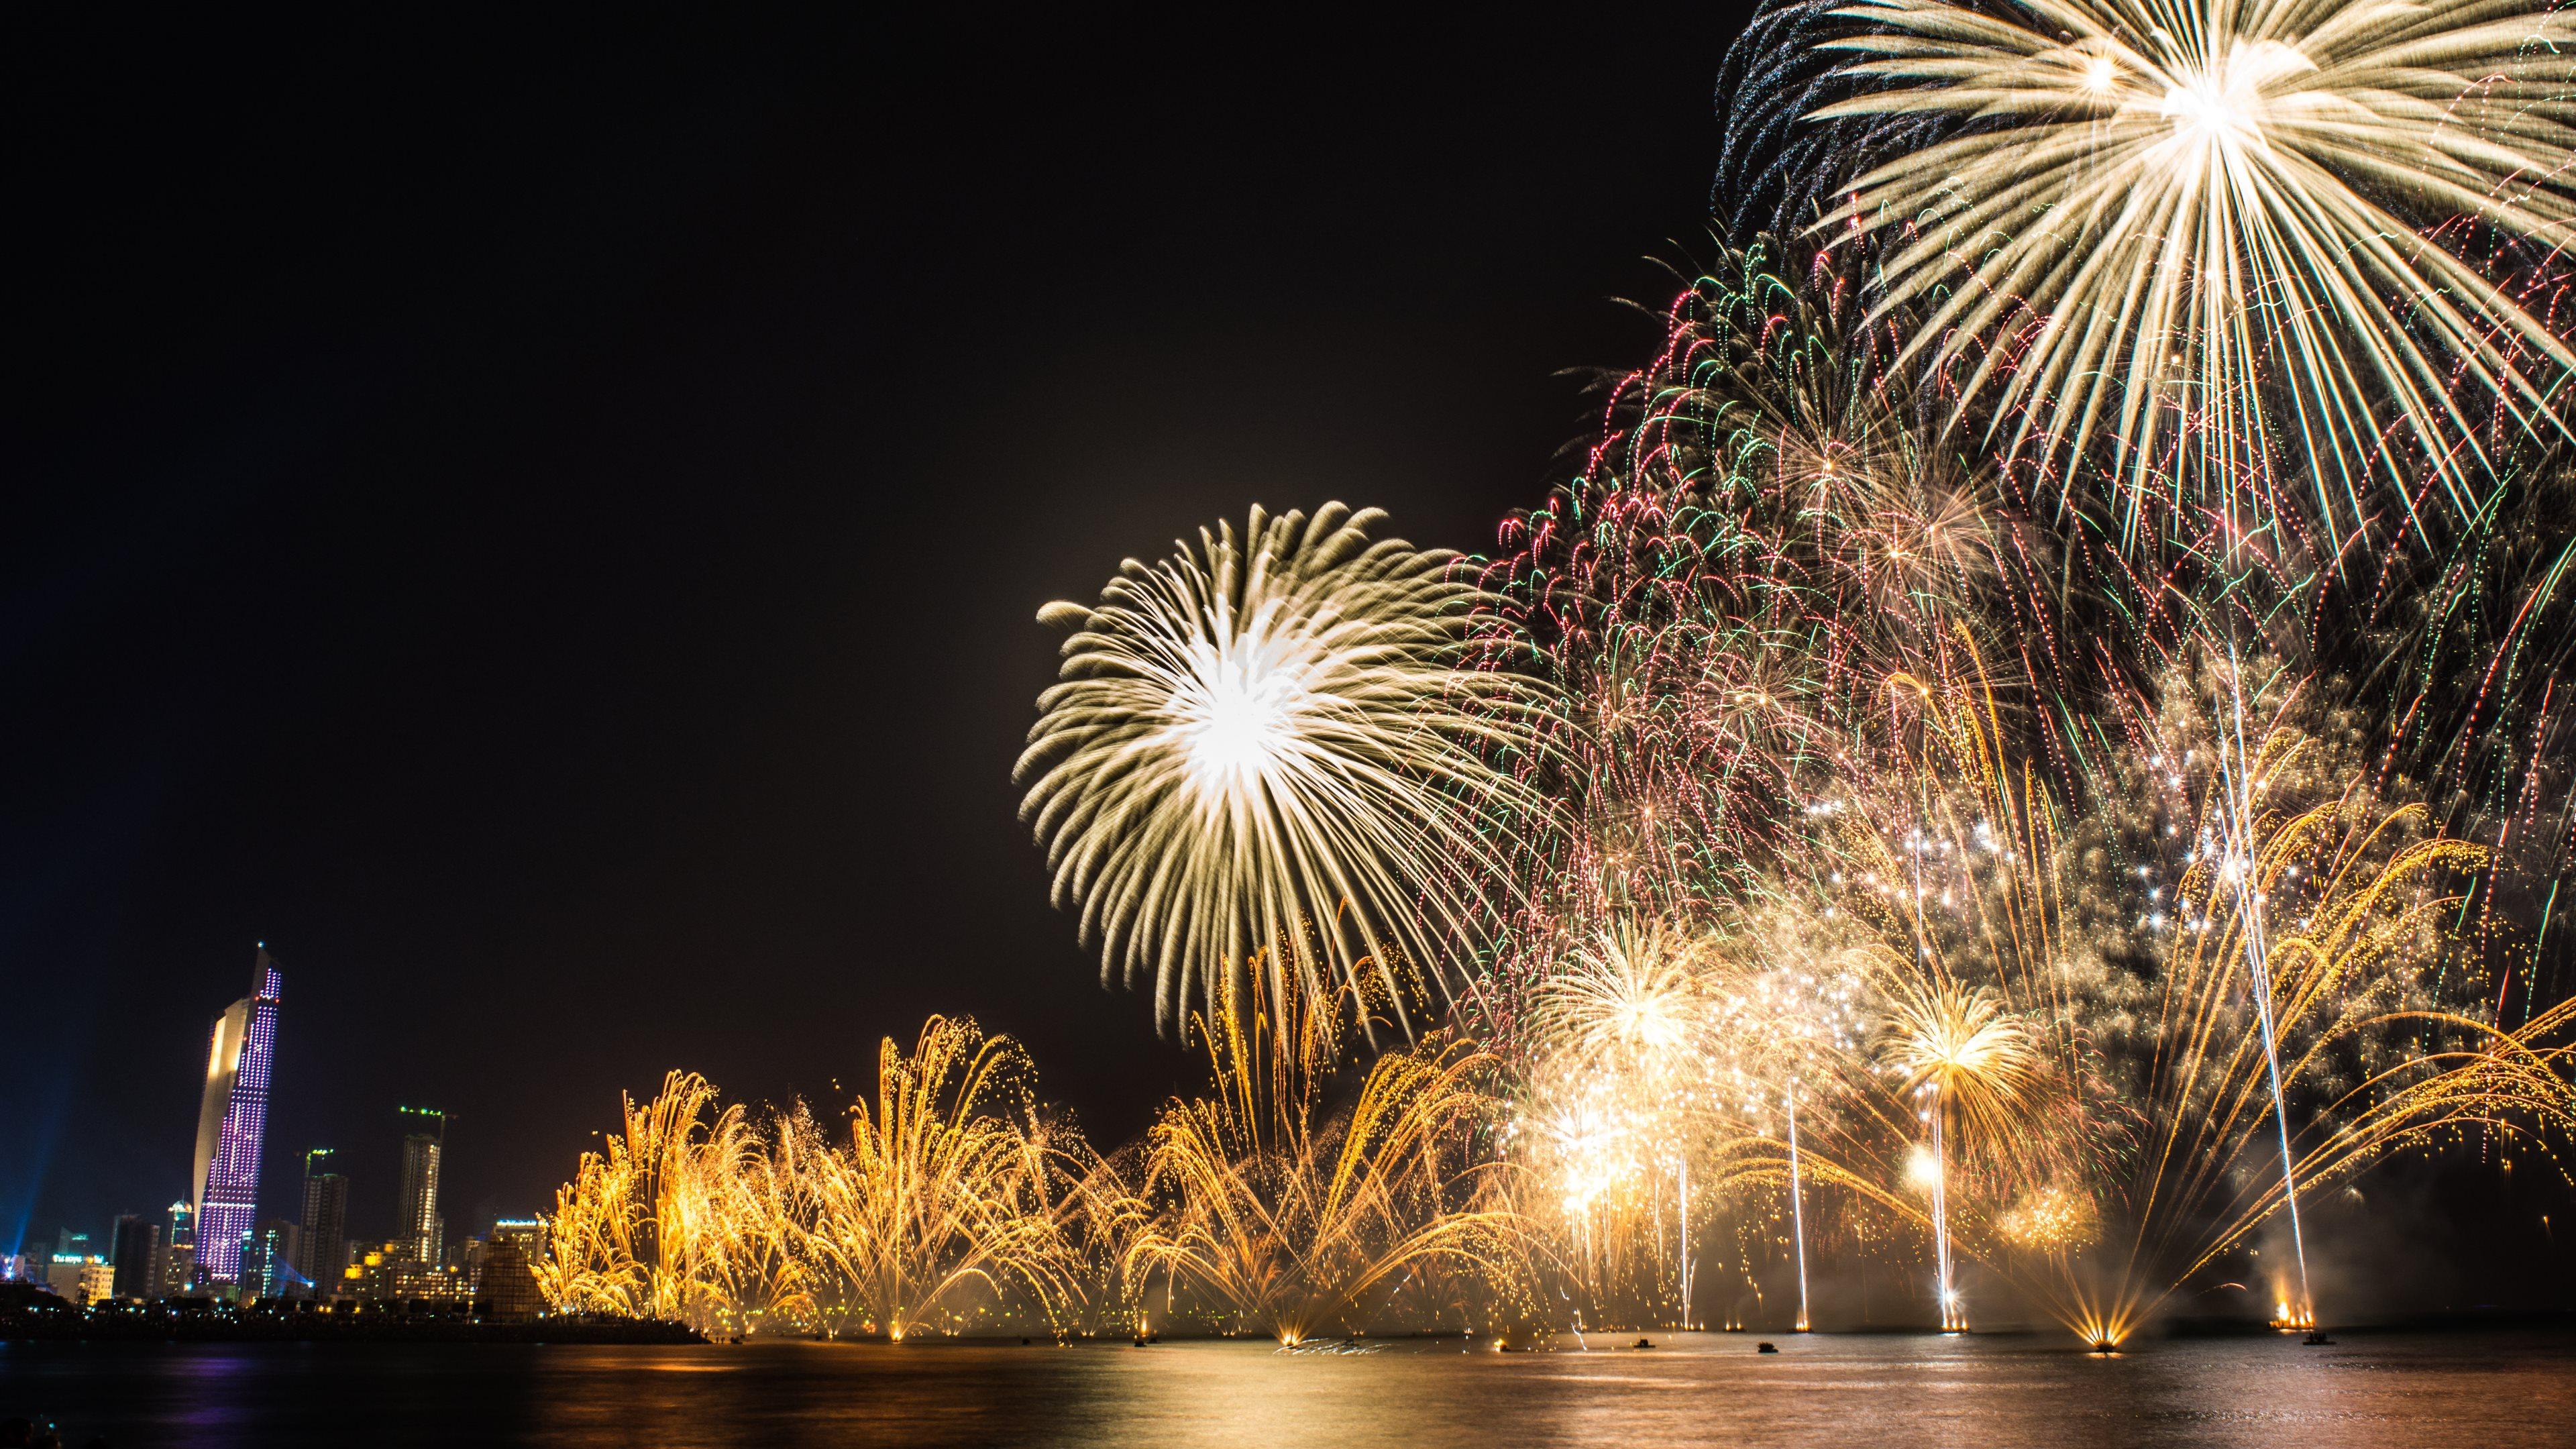 Fireworks Wallpaper for Computer